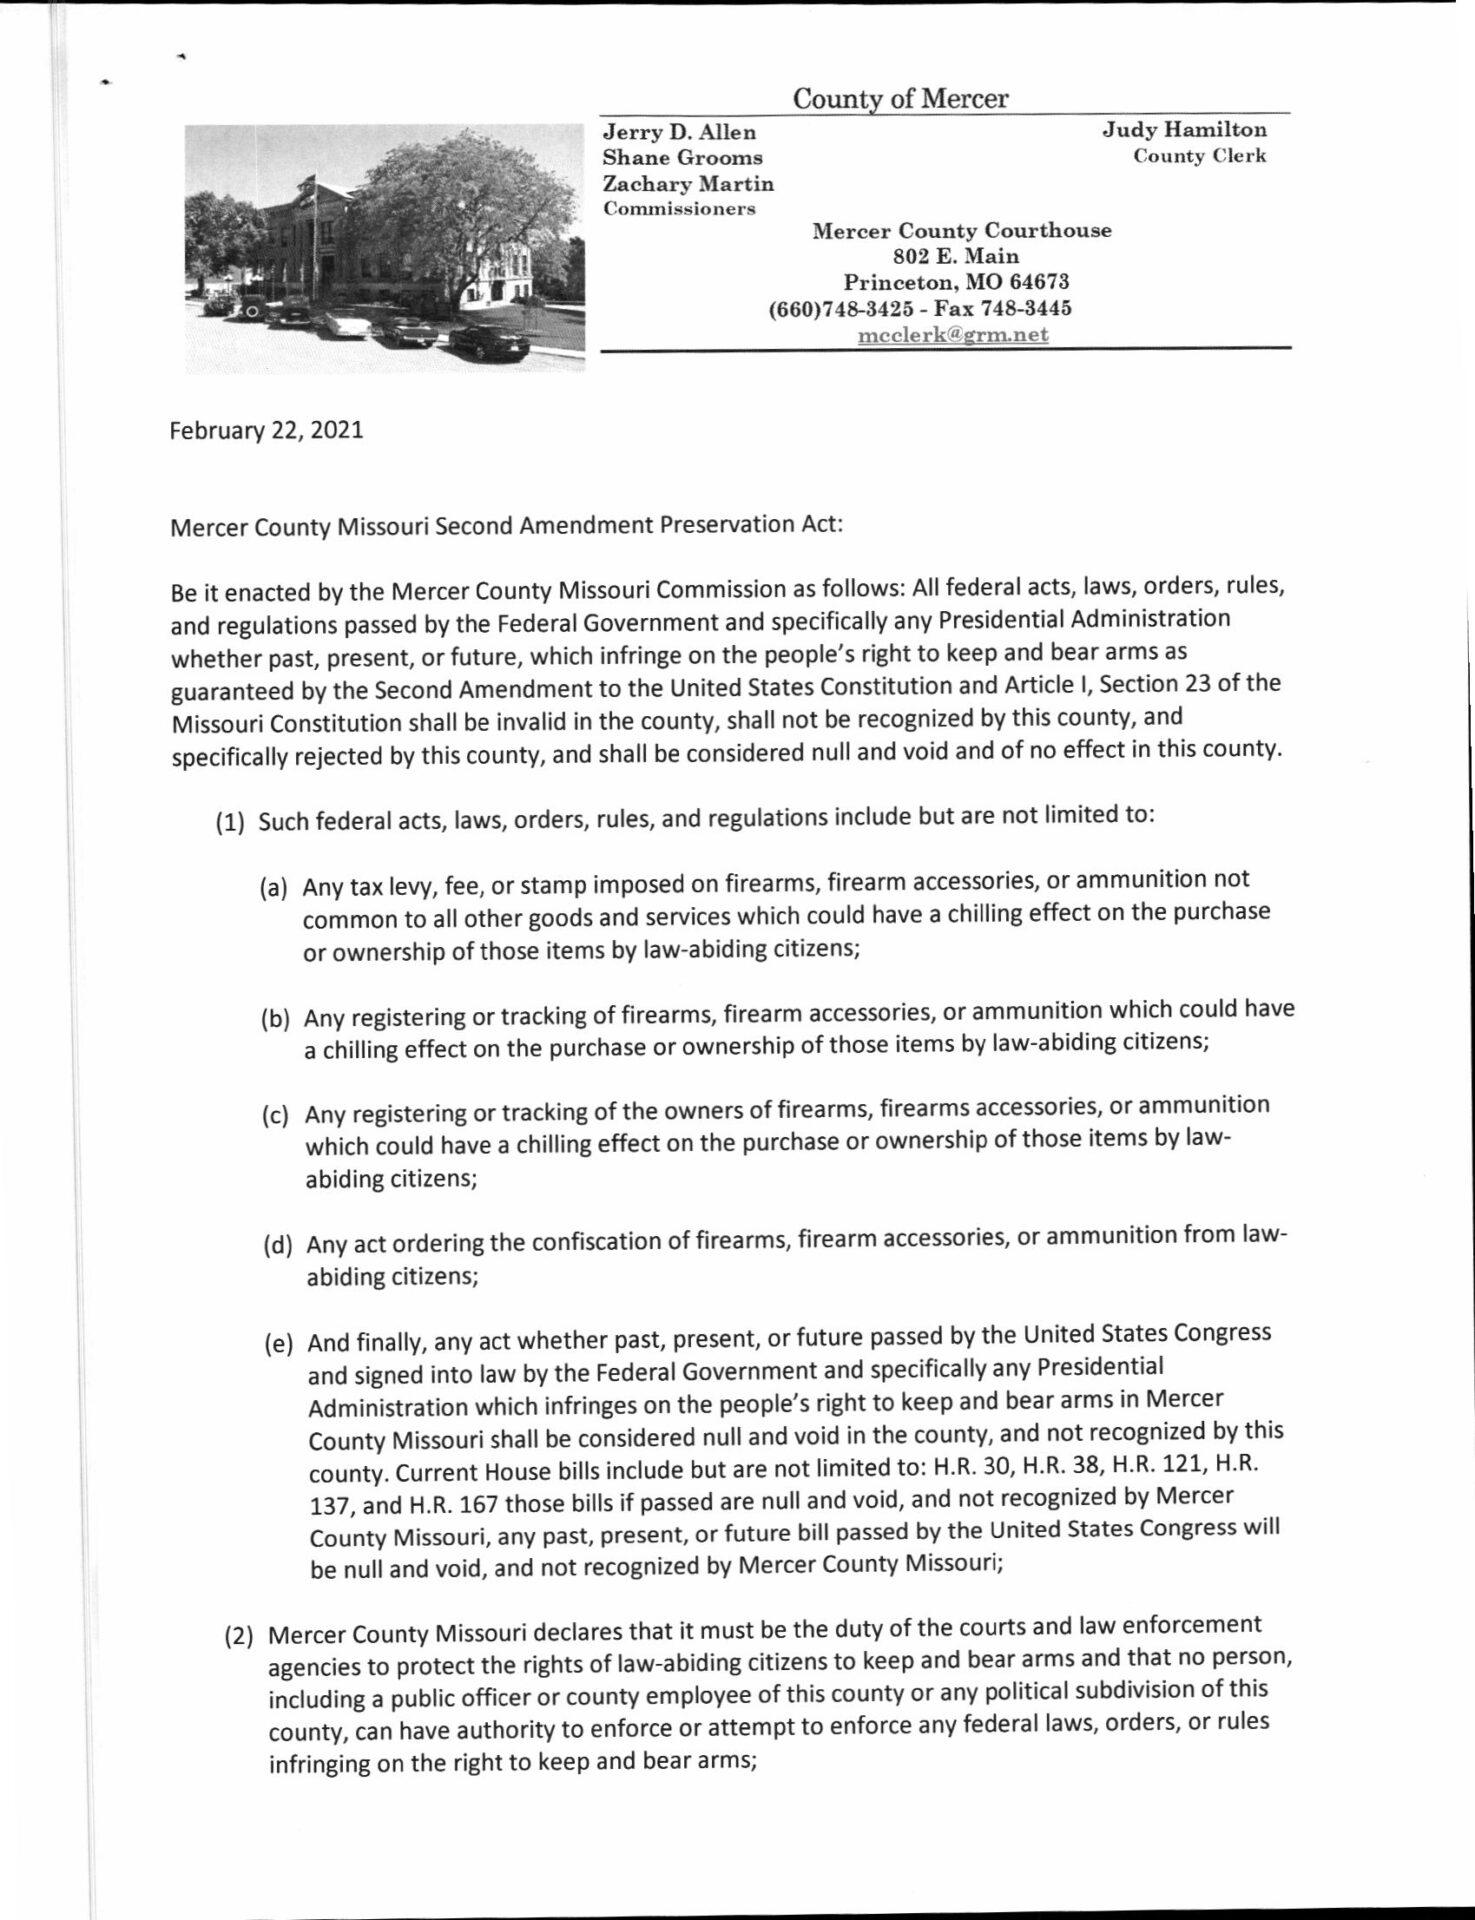 Mercer County Missouri Second Amendment Preservation Act pg1